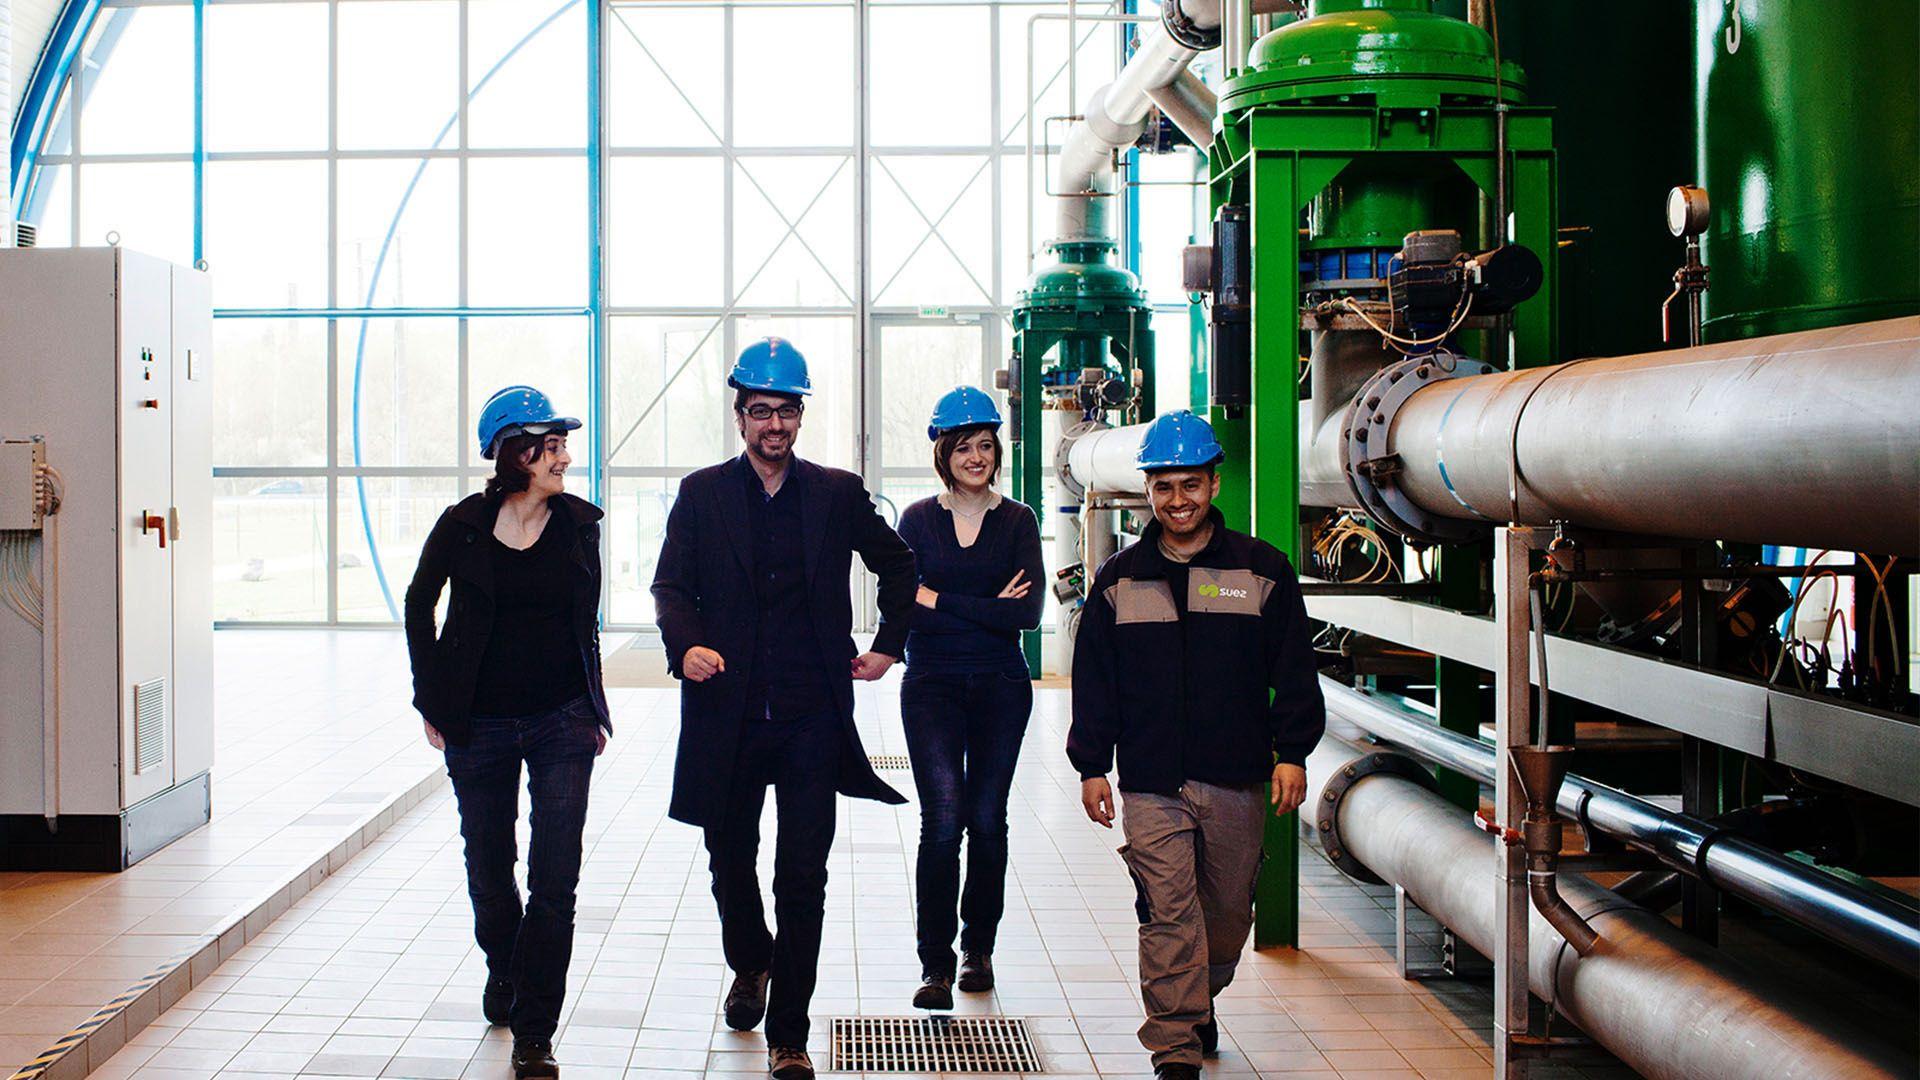 Employees walking round facility